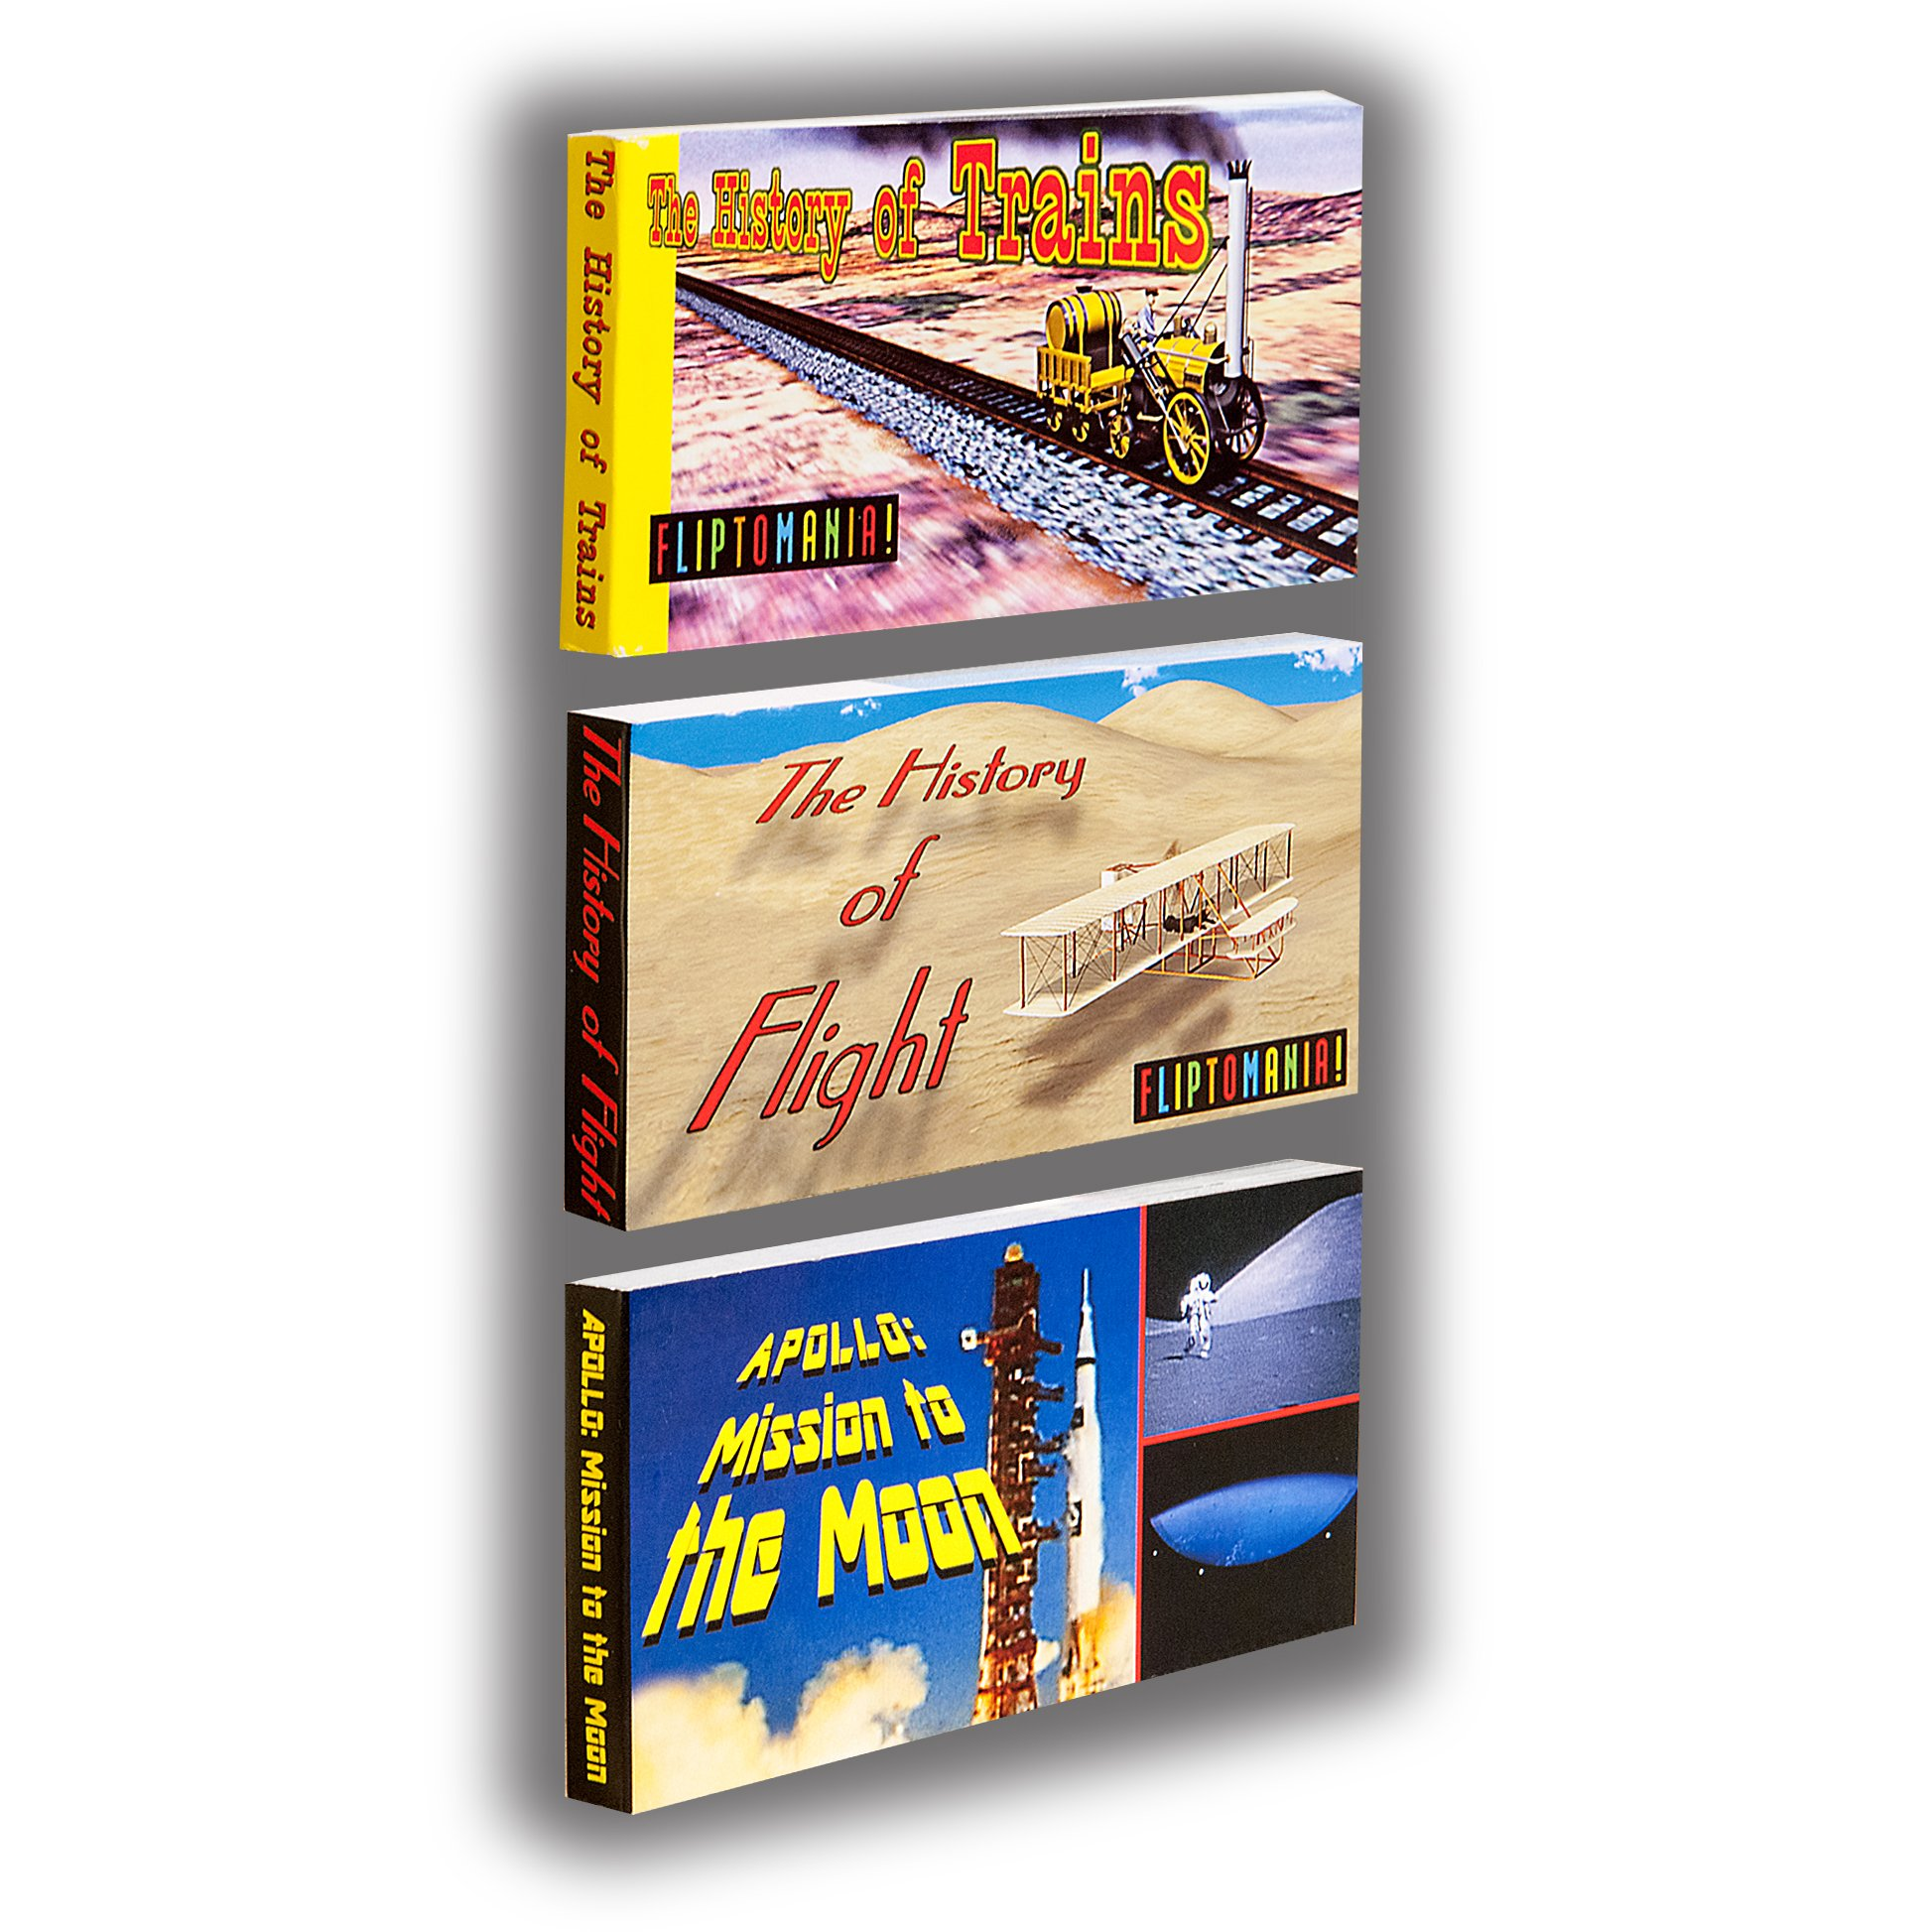 Fliptomania Planes, Trains, and Rockets Flipbook (3 Pack)